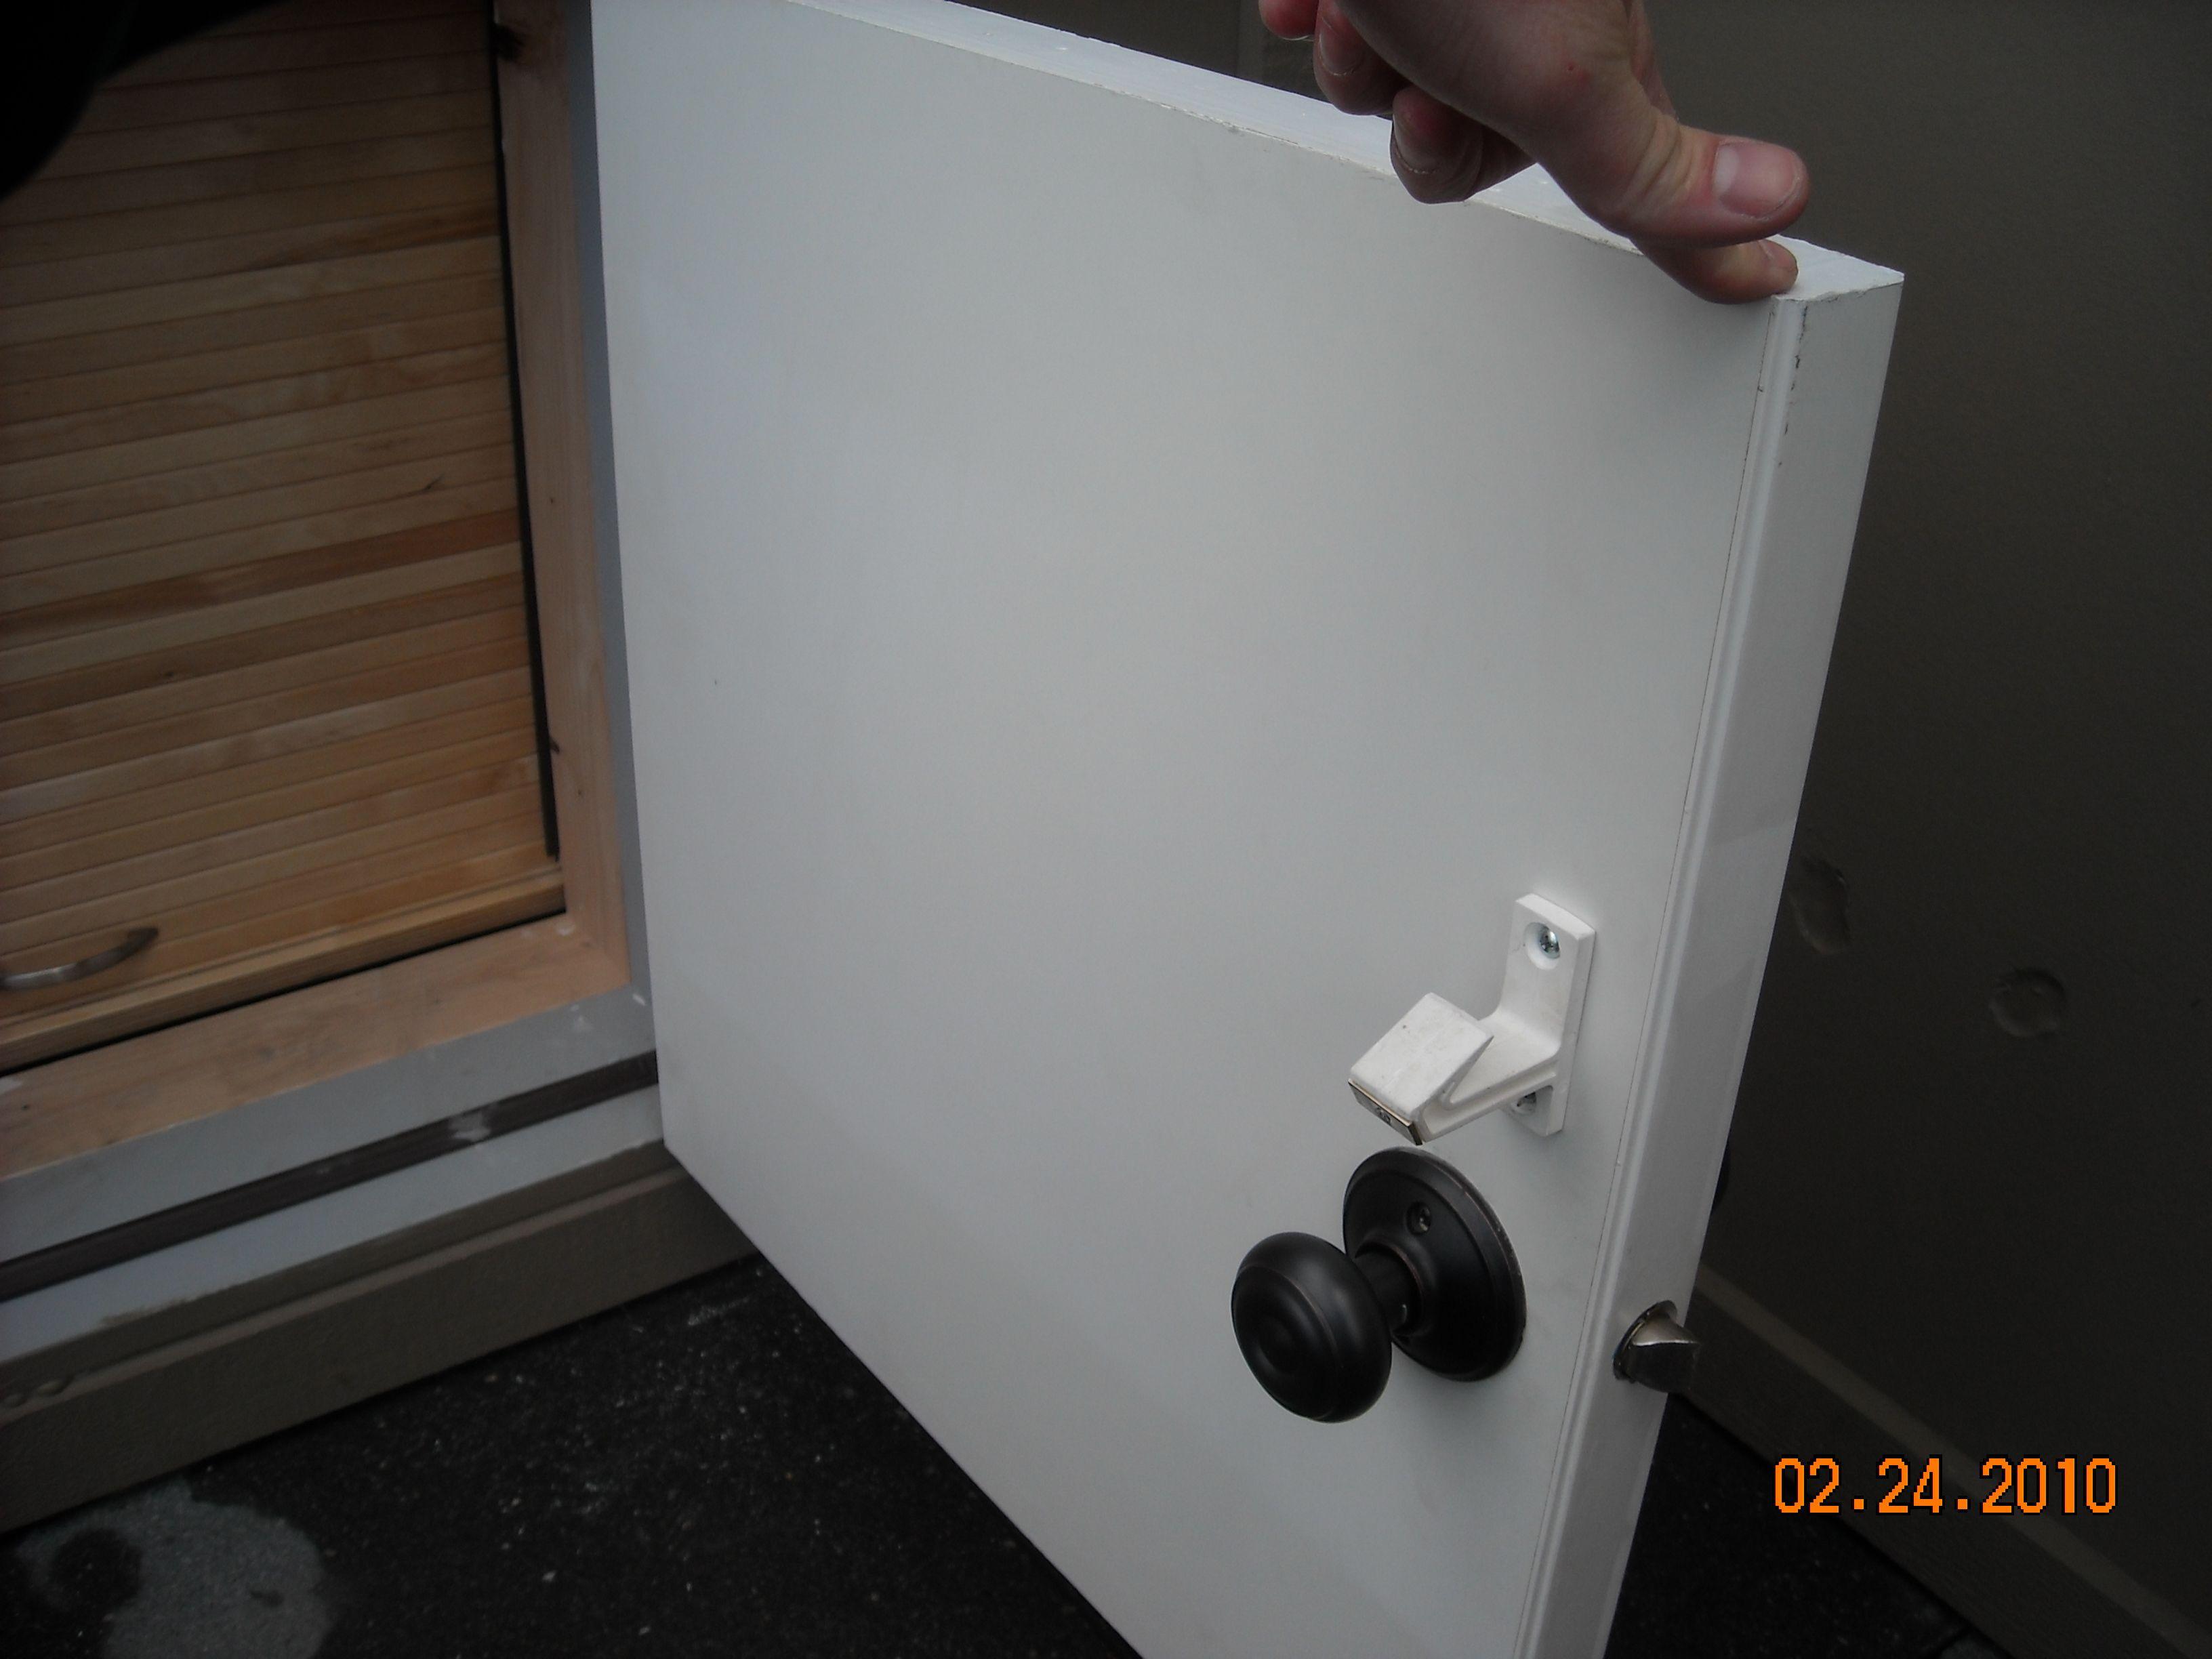 Dumbwaiter doors dumbwaiter u2013 ambassador dr u2013 for Exterior dumbwaiter